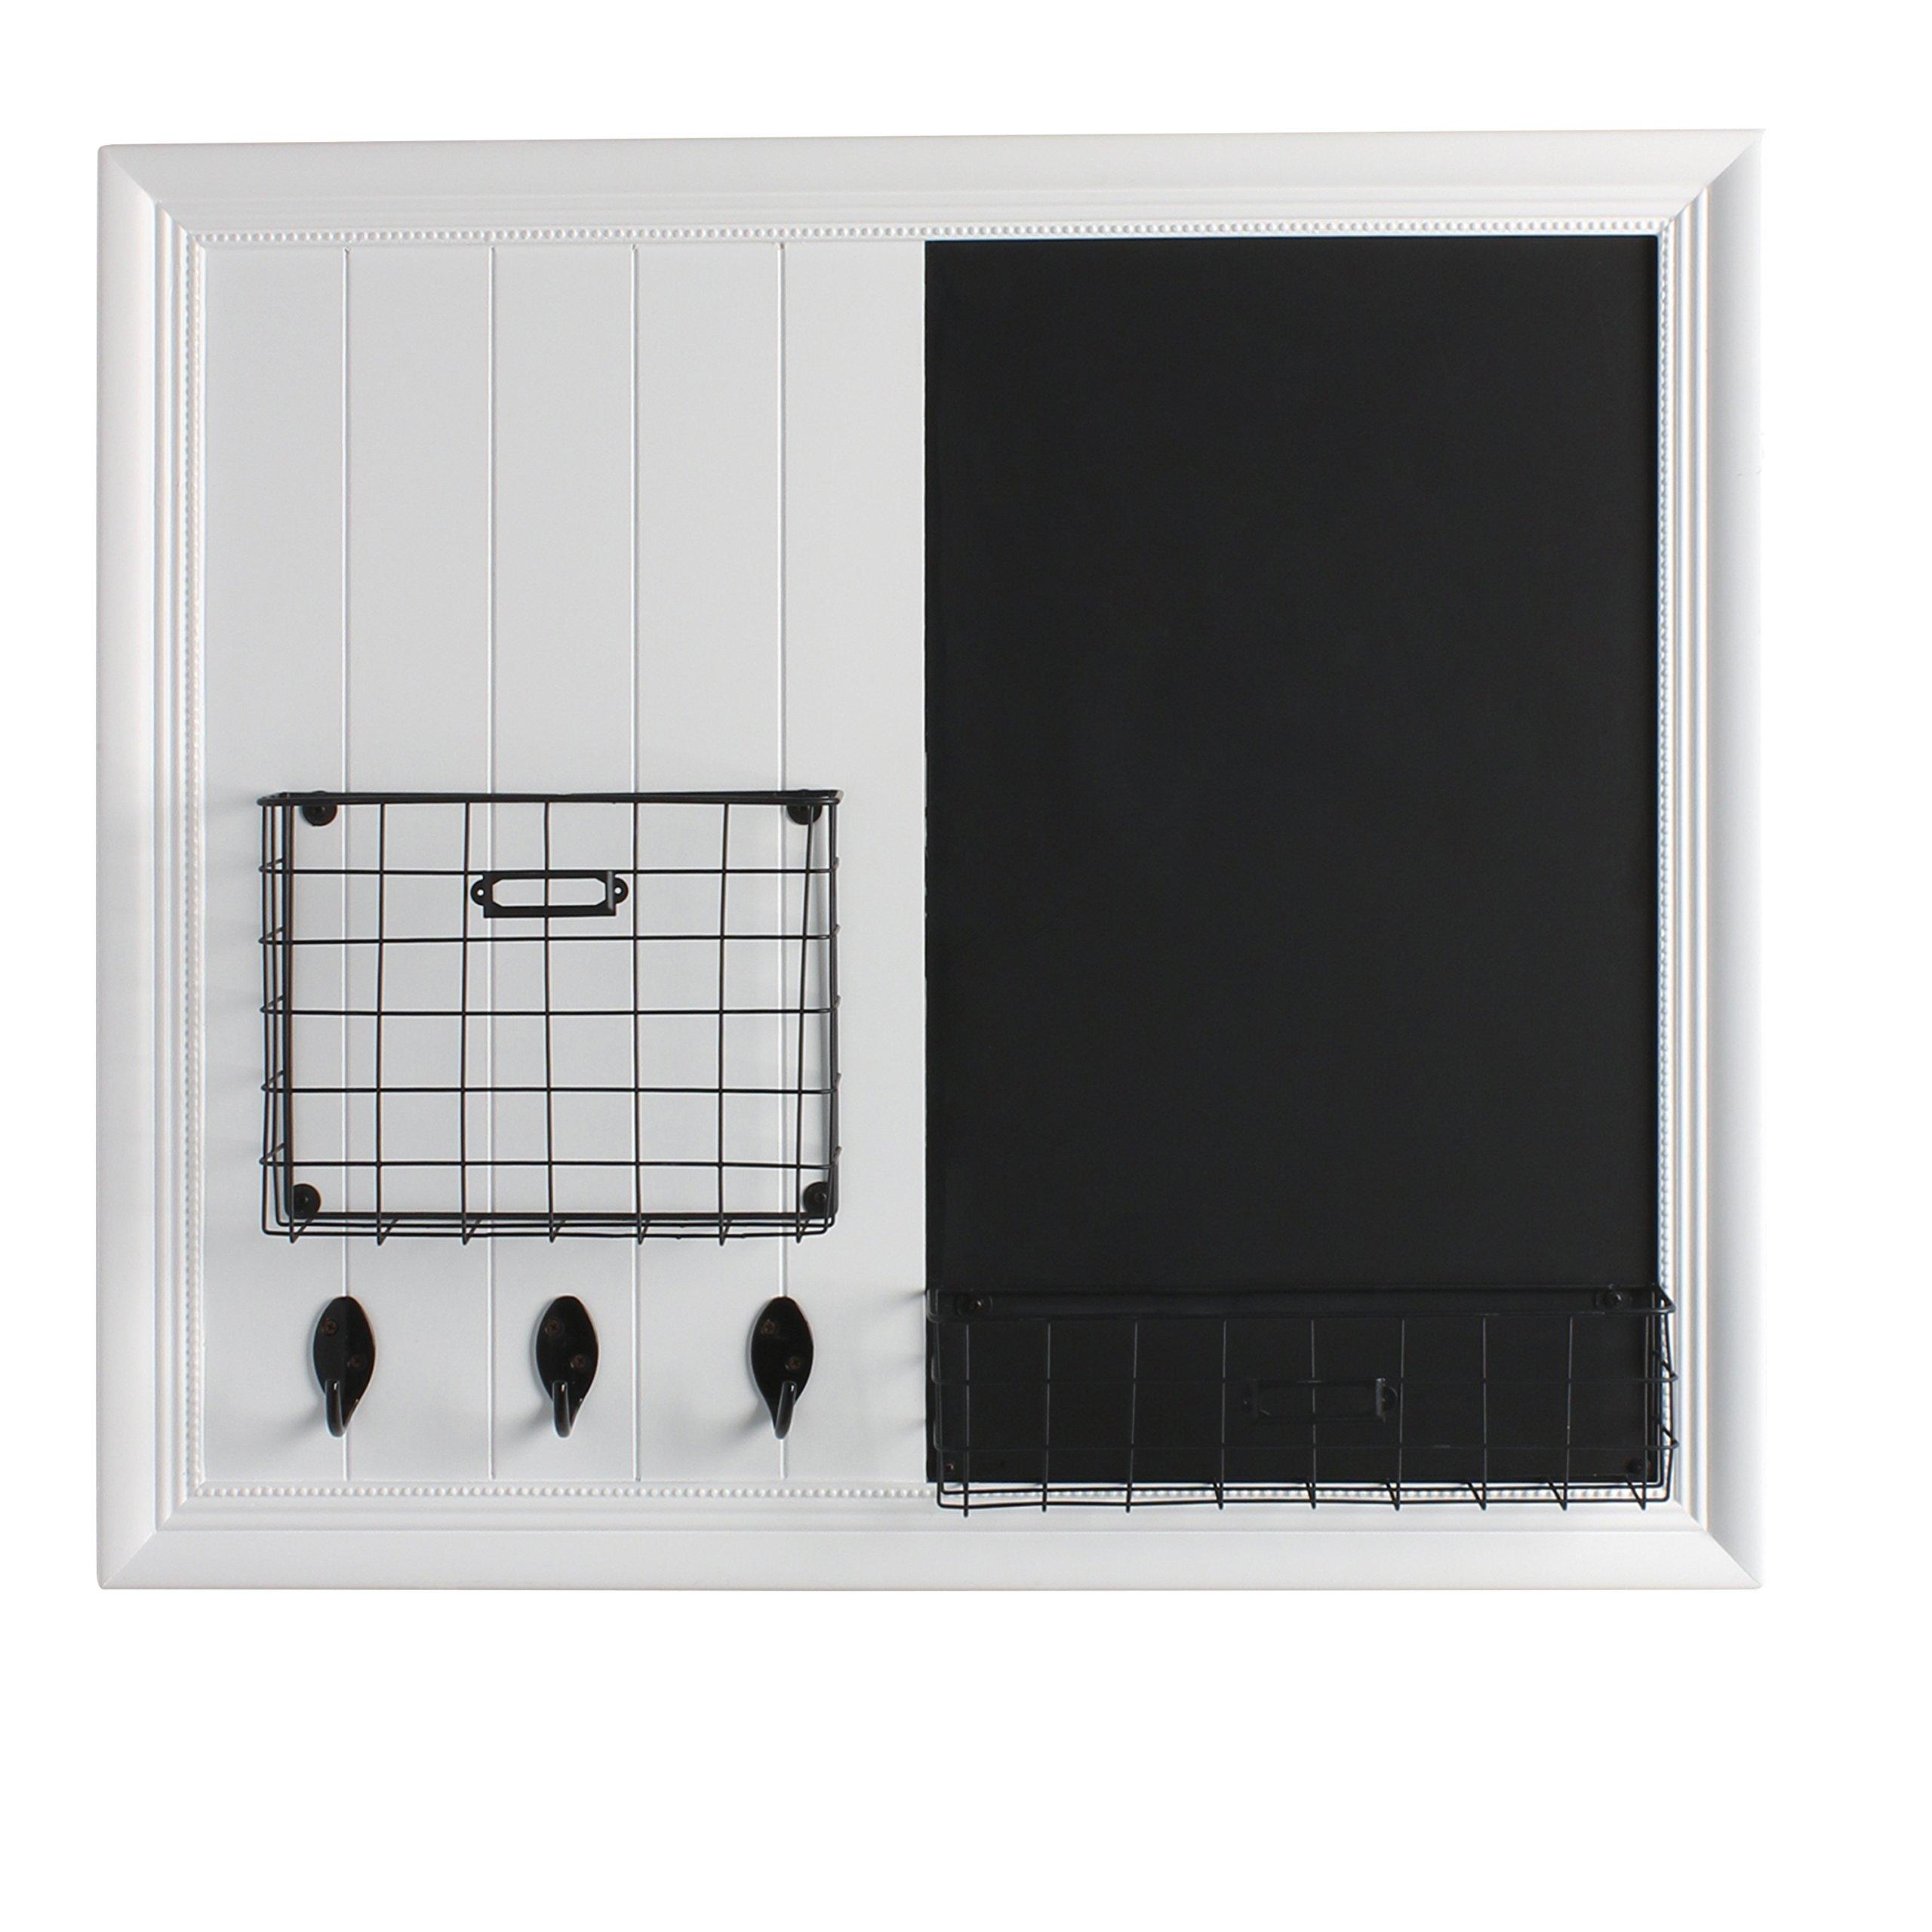 DesignOvation Darla Decorative Wood Home Organizer with Chalkboard, Wire Baskets, Key Hooks, White (209335)